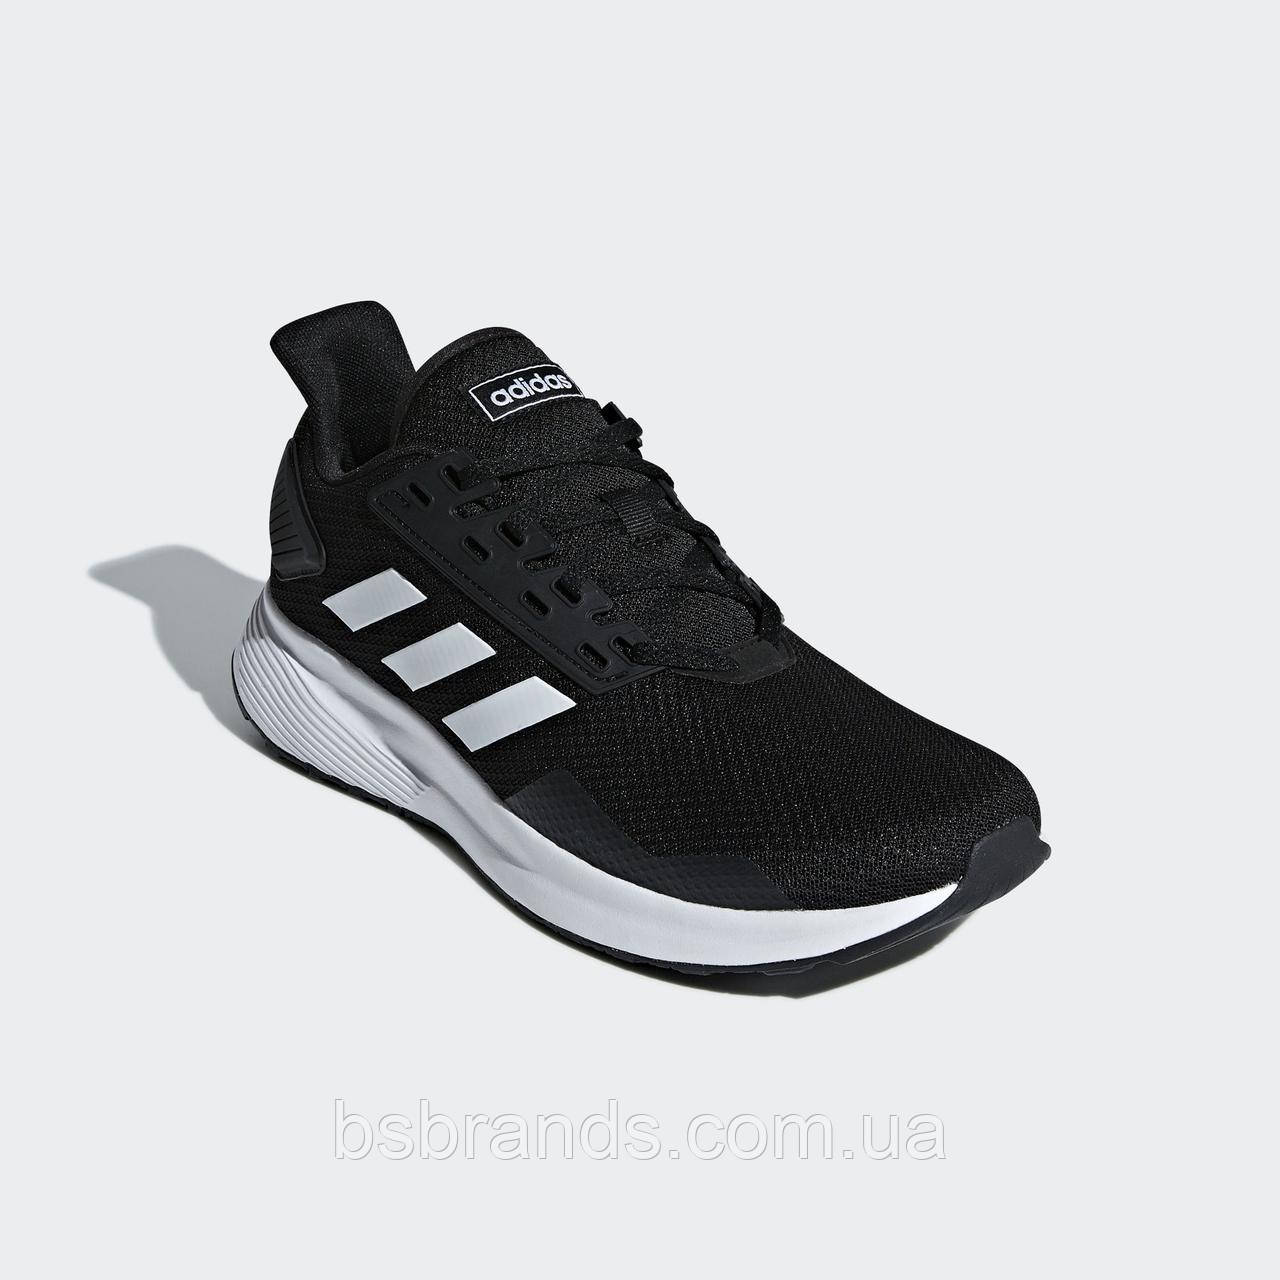 Мужские кроссовки Adidas Duramo 9 (Артикул:BB7066)